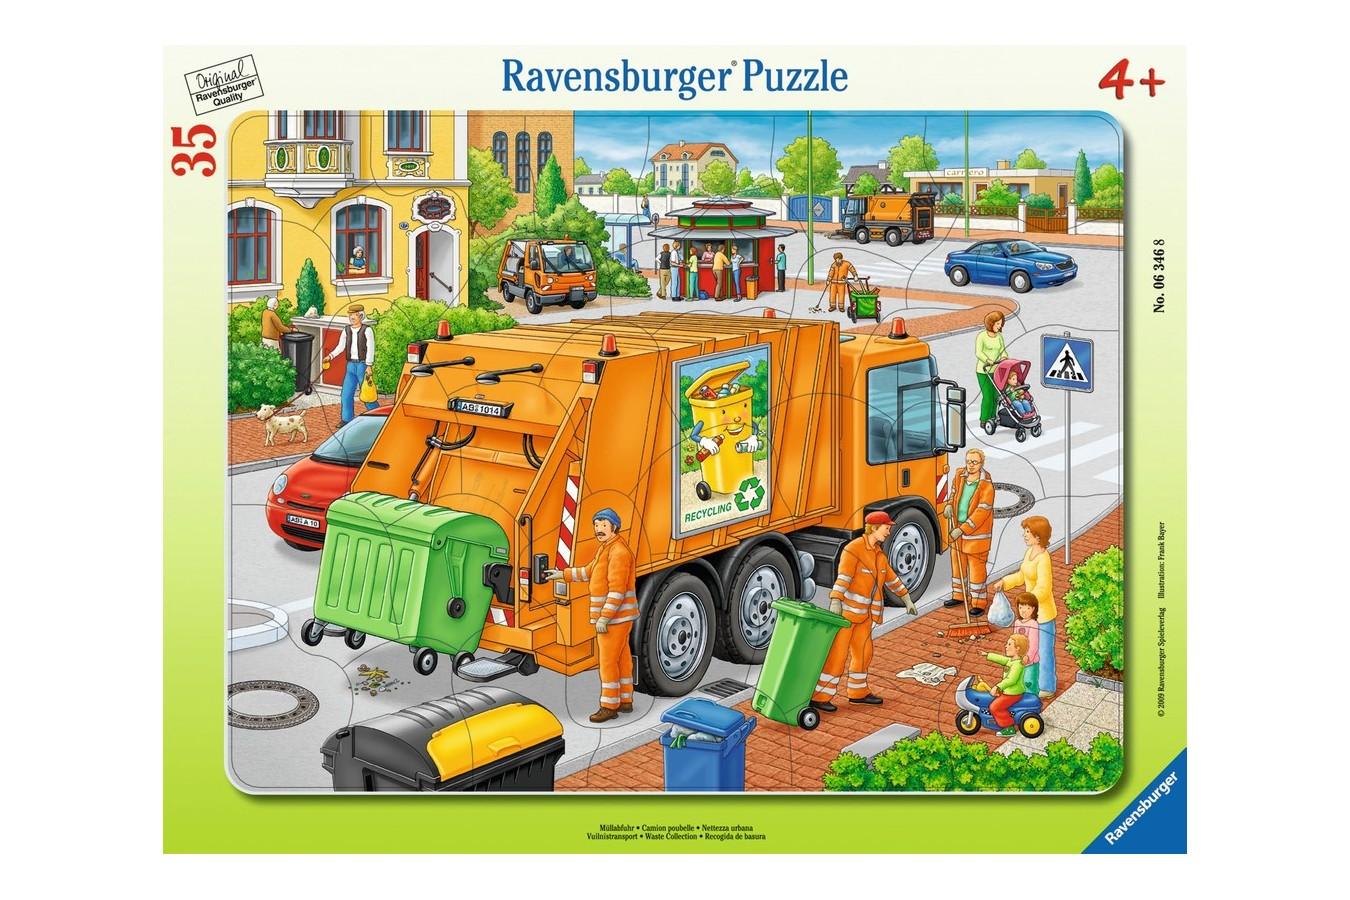 Puzzle Ravensburger - Masina De Colectat Gunoi, 35 piese (06346)